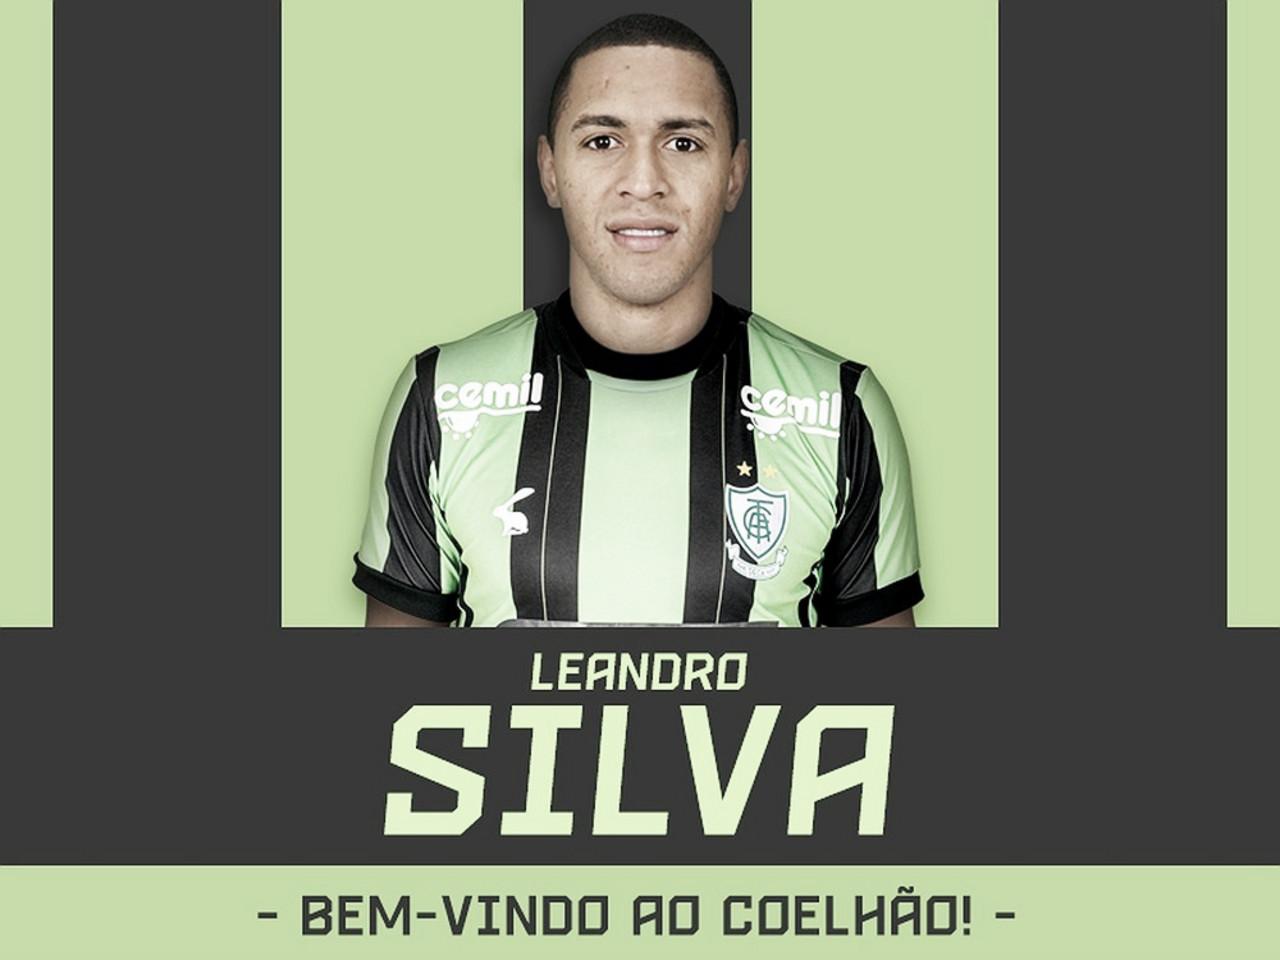 América-MG oficializa à volta do lateral Leandro Silva